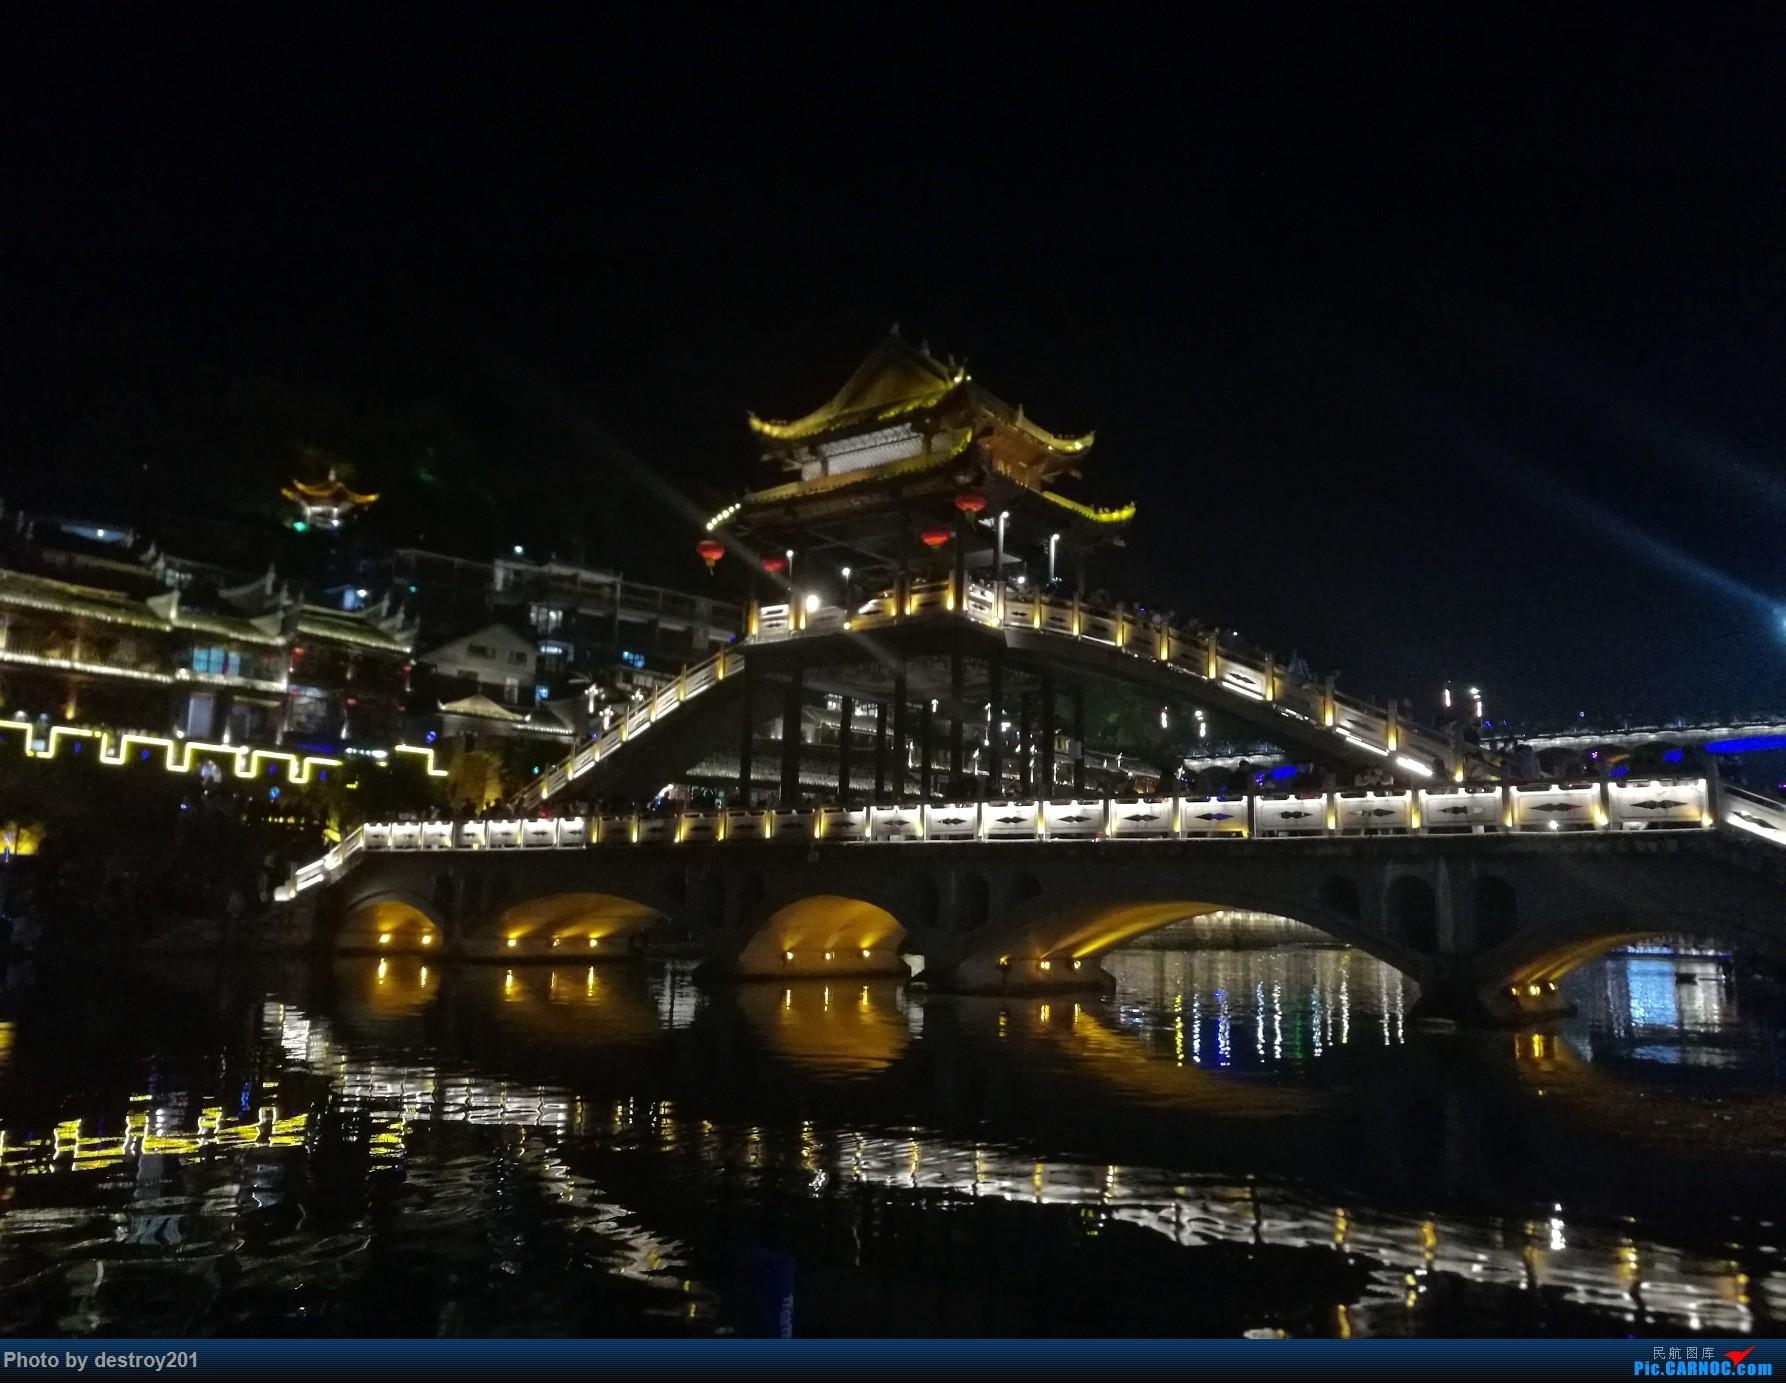 Re:[原创]【梧州飞友会】五一从梧州西江机场出发,长沙-怀化-凤凰古城游记